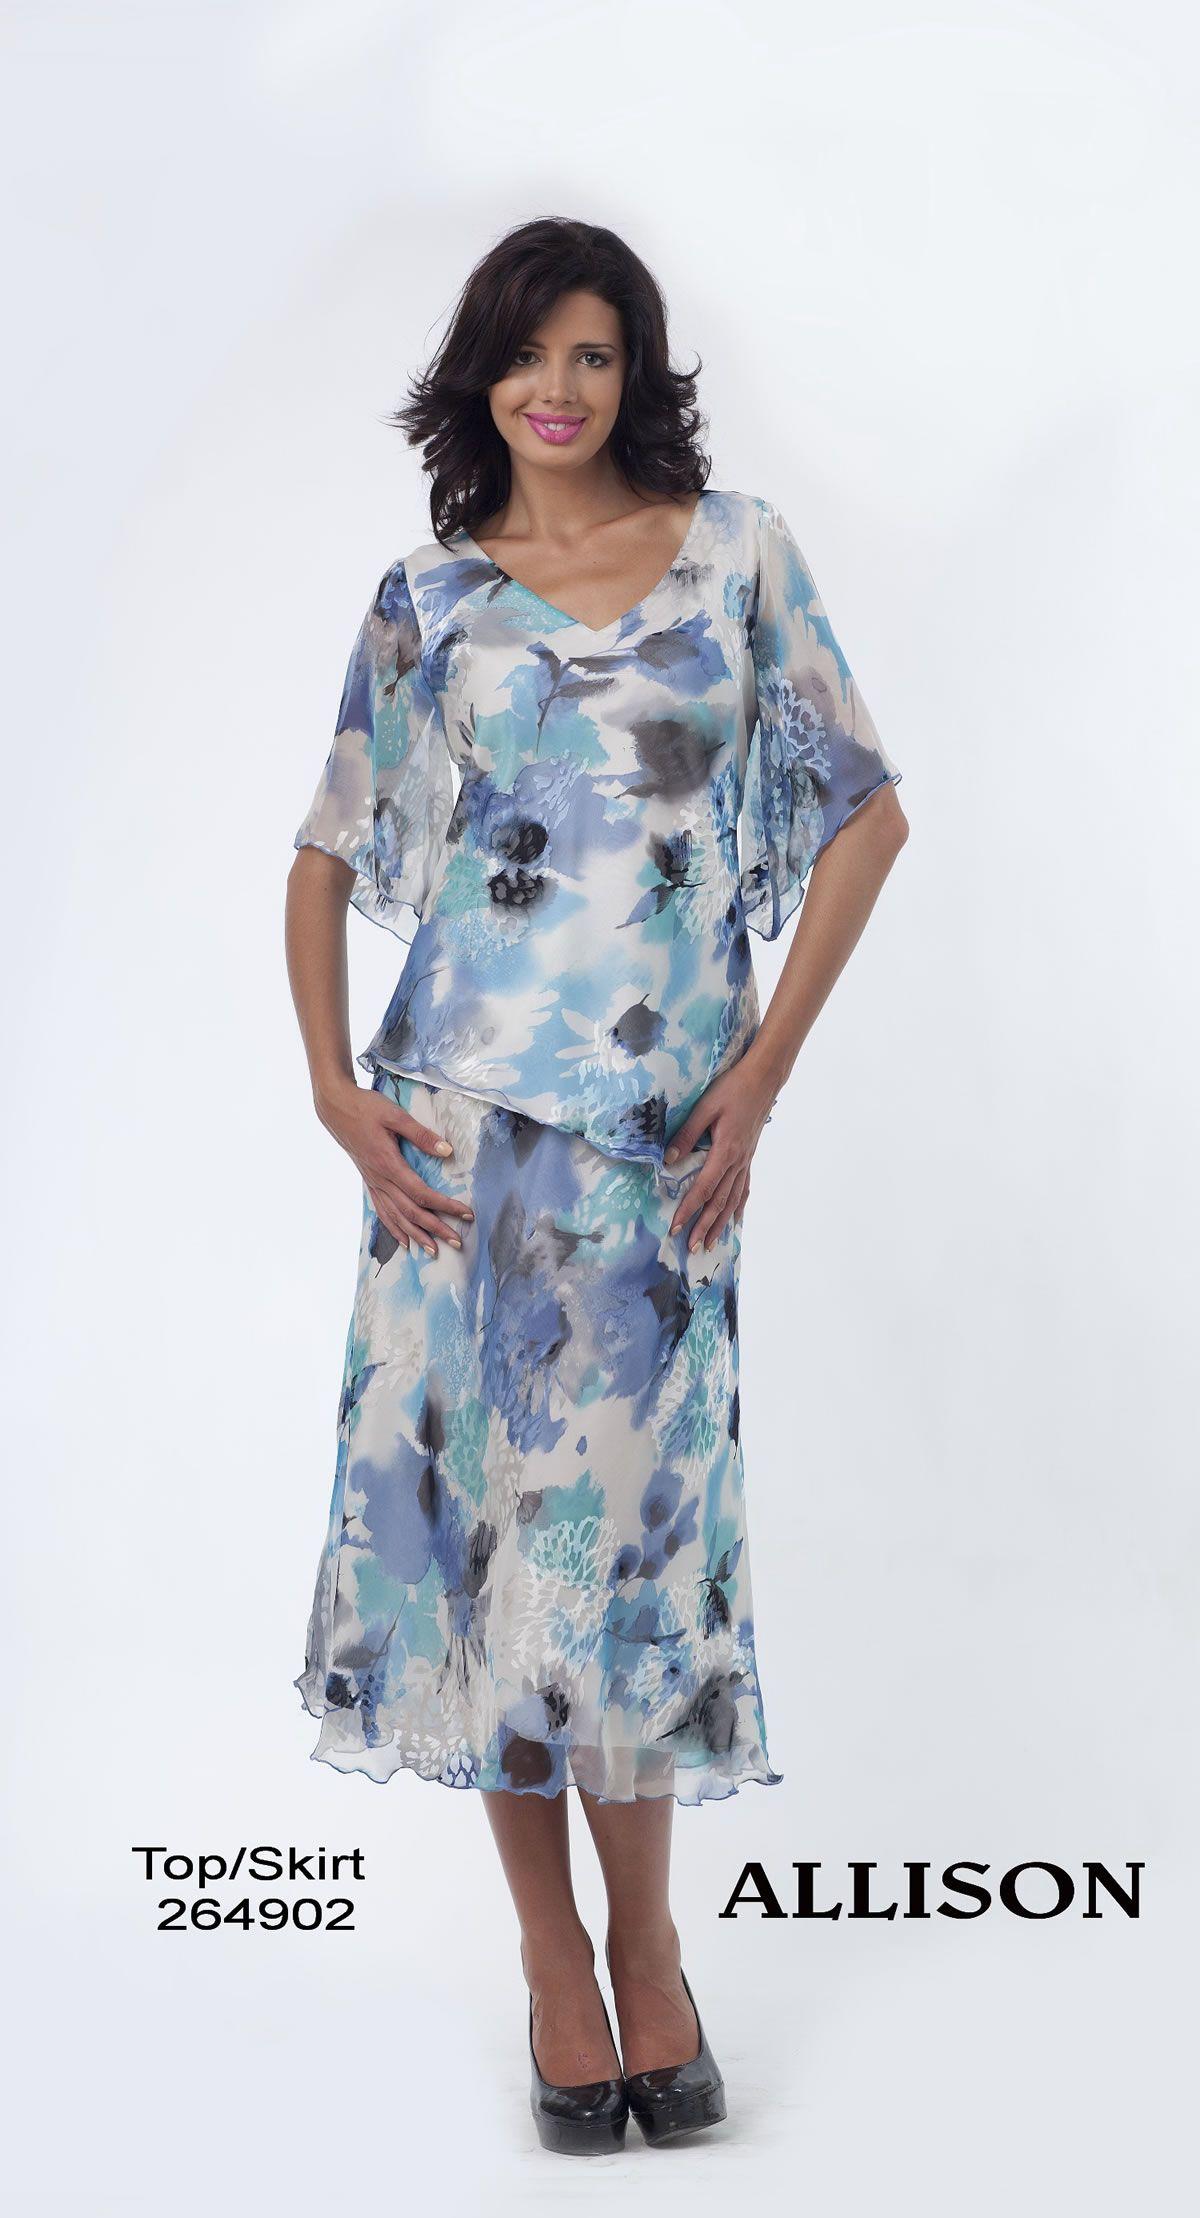 Allison Floaty Dresses For Beach Weddings Abroad Fab Frocks Dresses Fab Frocks Floaty Dress